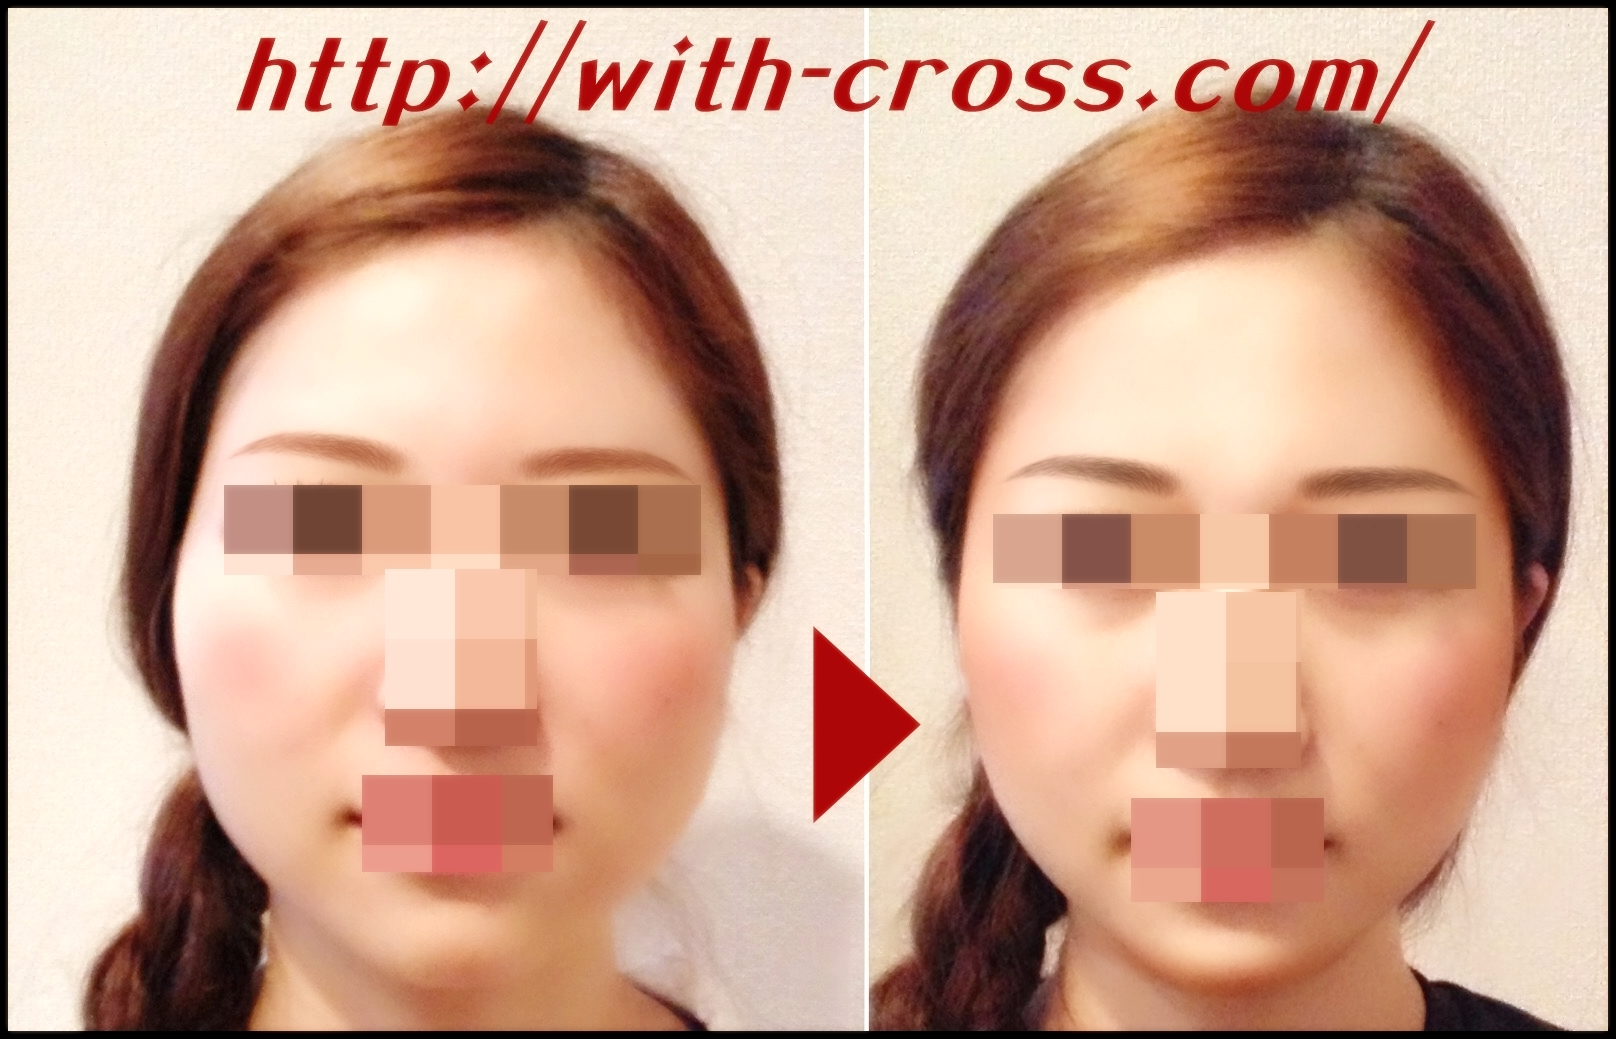 crossfacebeforeafter